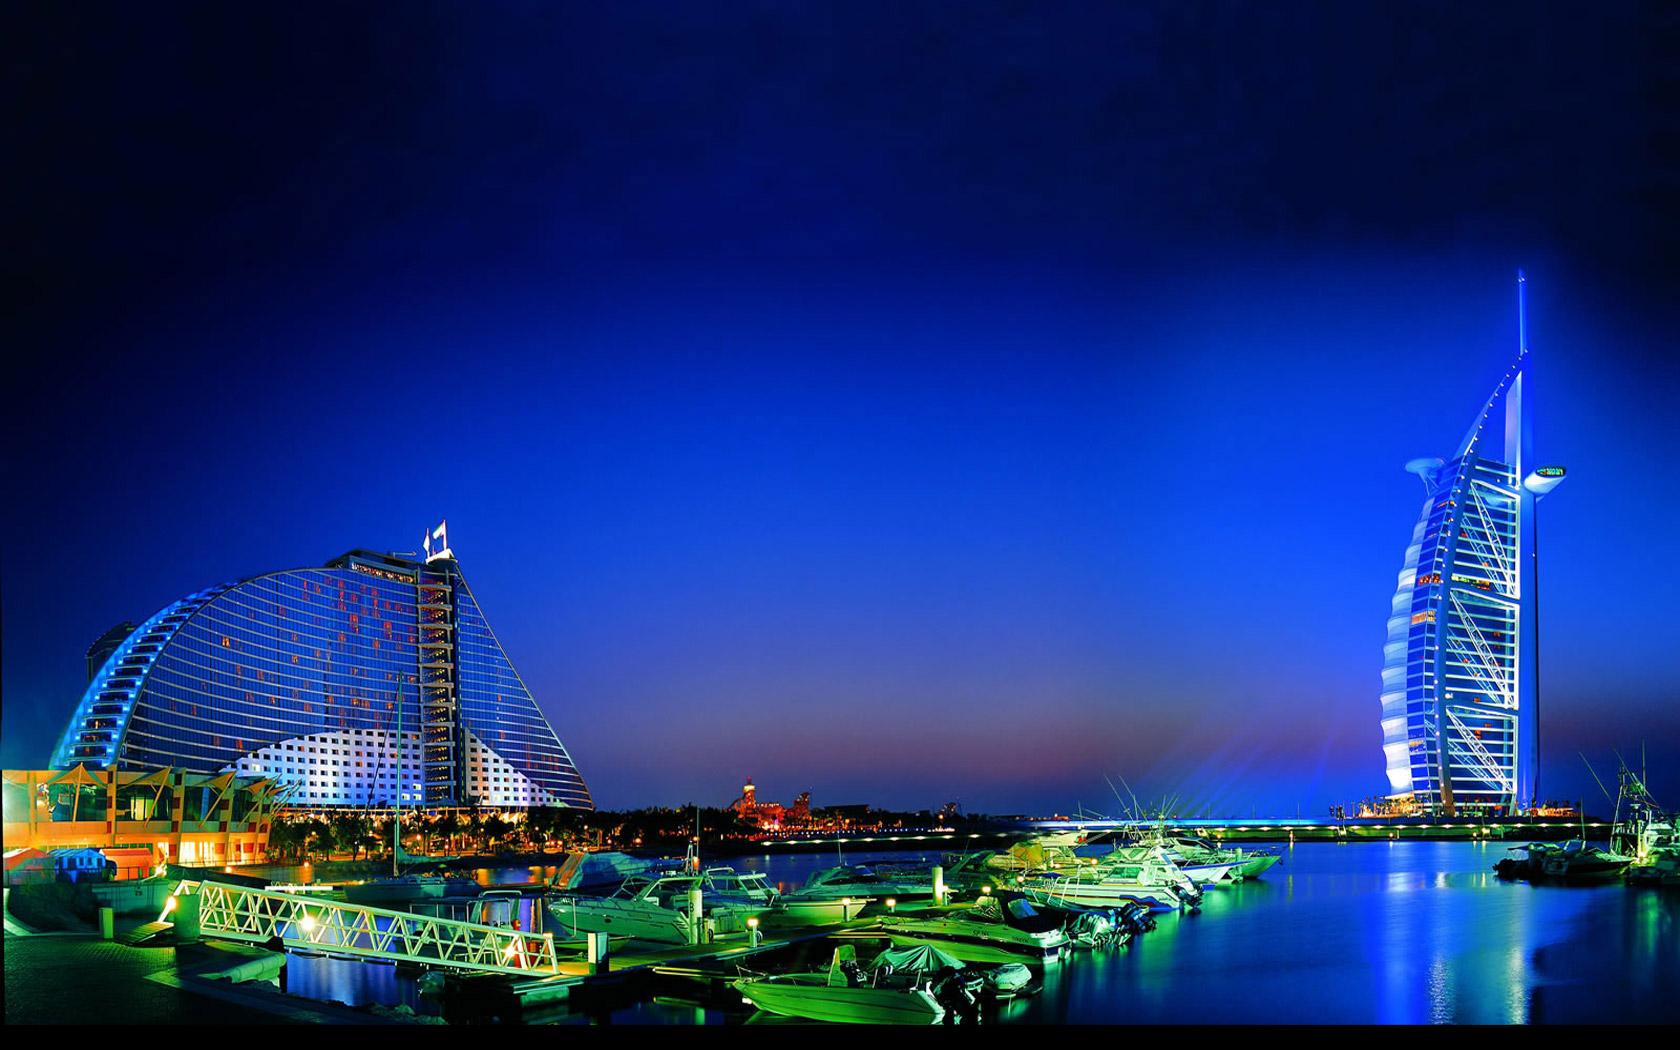 Vize za Dubai Emirati viza cene uslovi - Vize Dubai formular